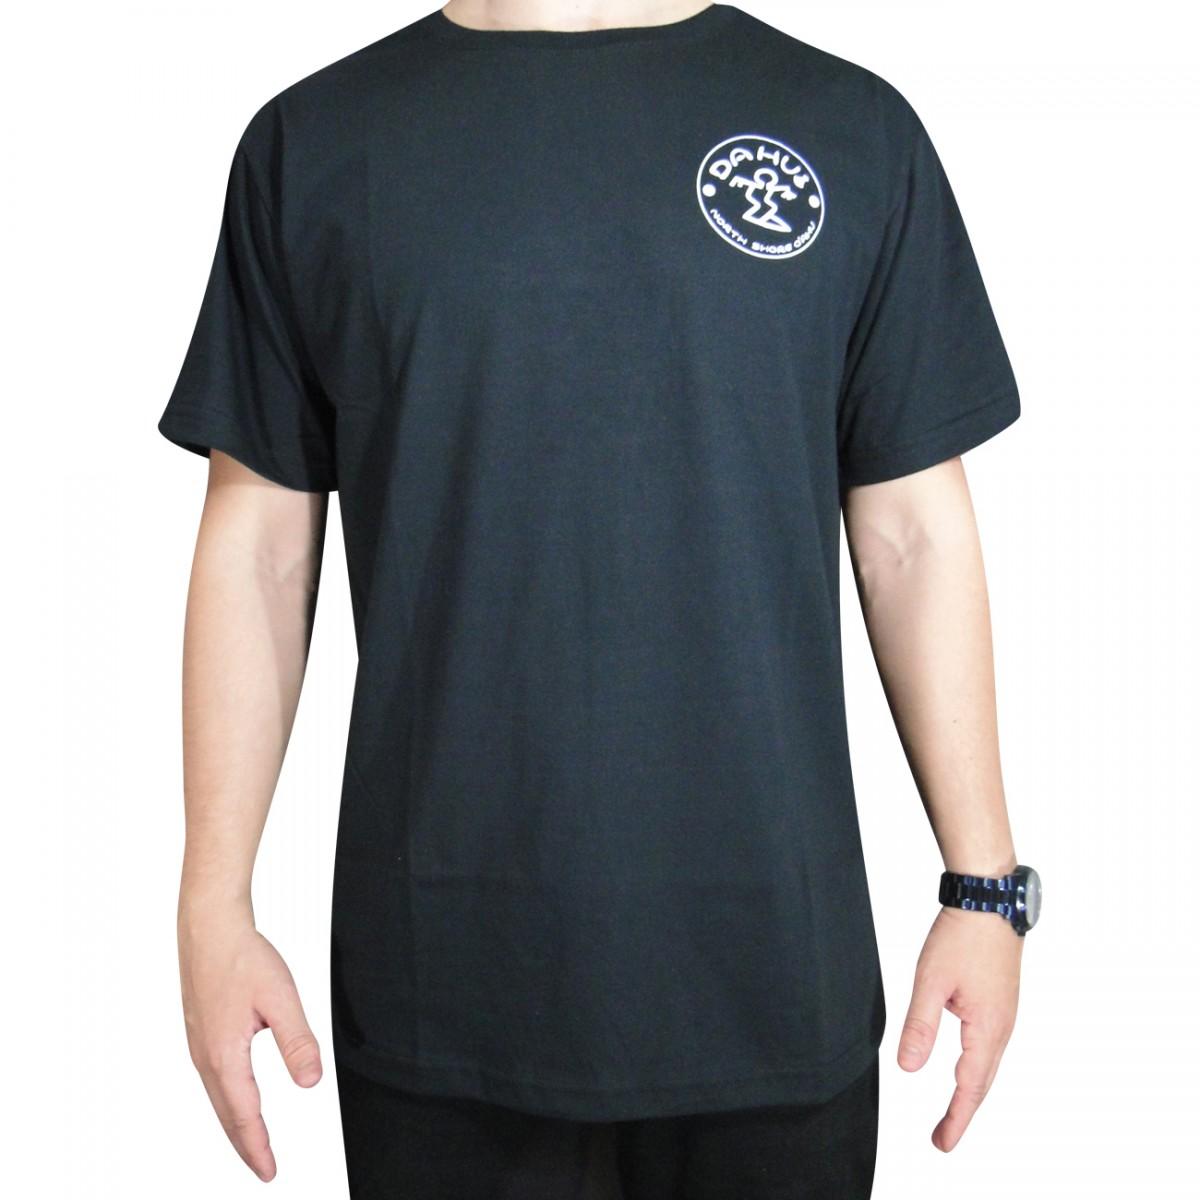 ... da5e31b18a2 Camiseta Da Hui 11375037025 11375037025 - Preto - Chuteira  Nike 06870578ba918